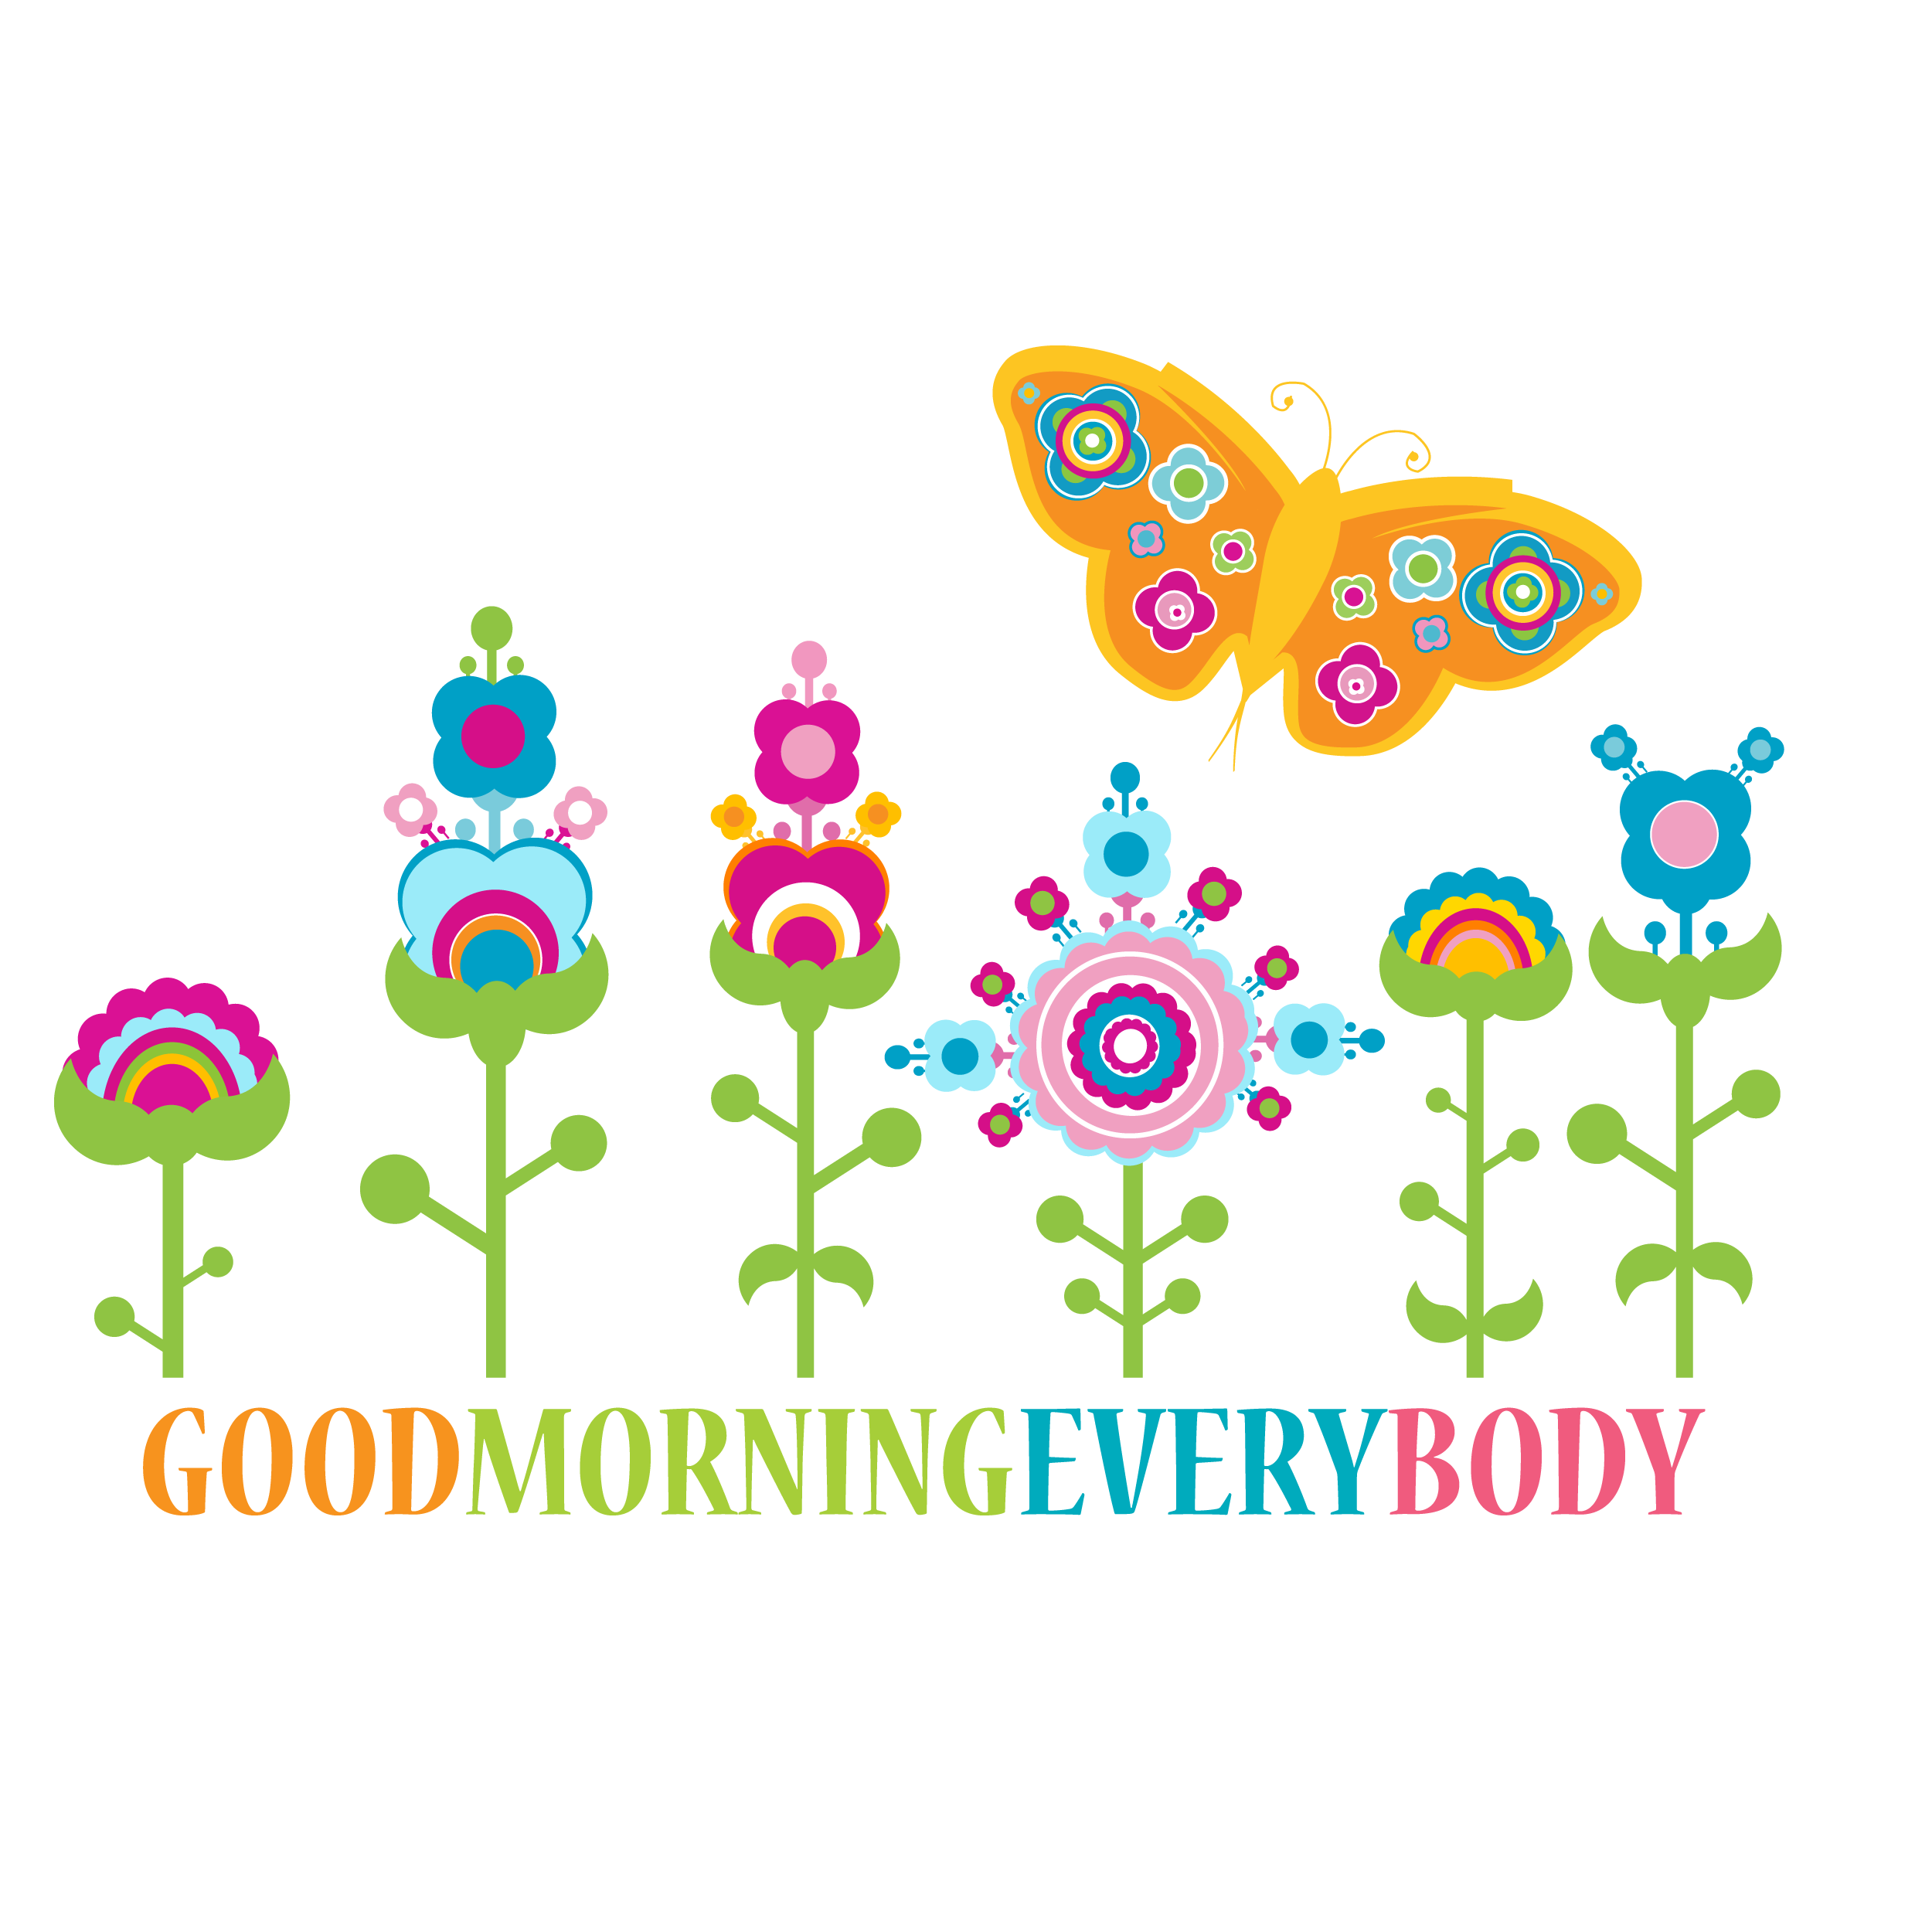 download good morning png hq png image freepngimg beaver clip art images free beaver clipart outline